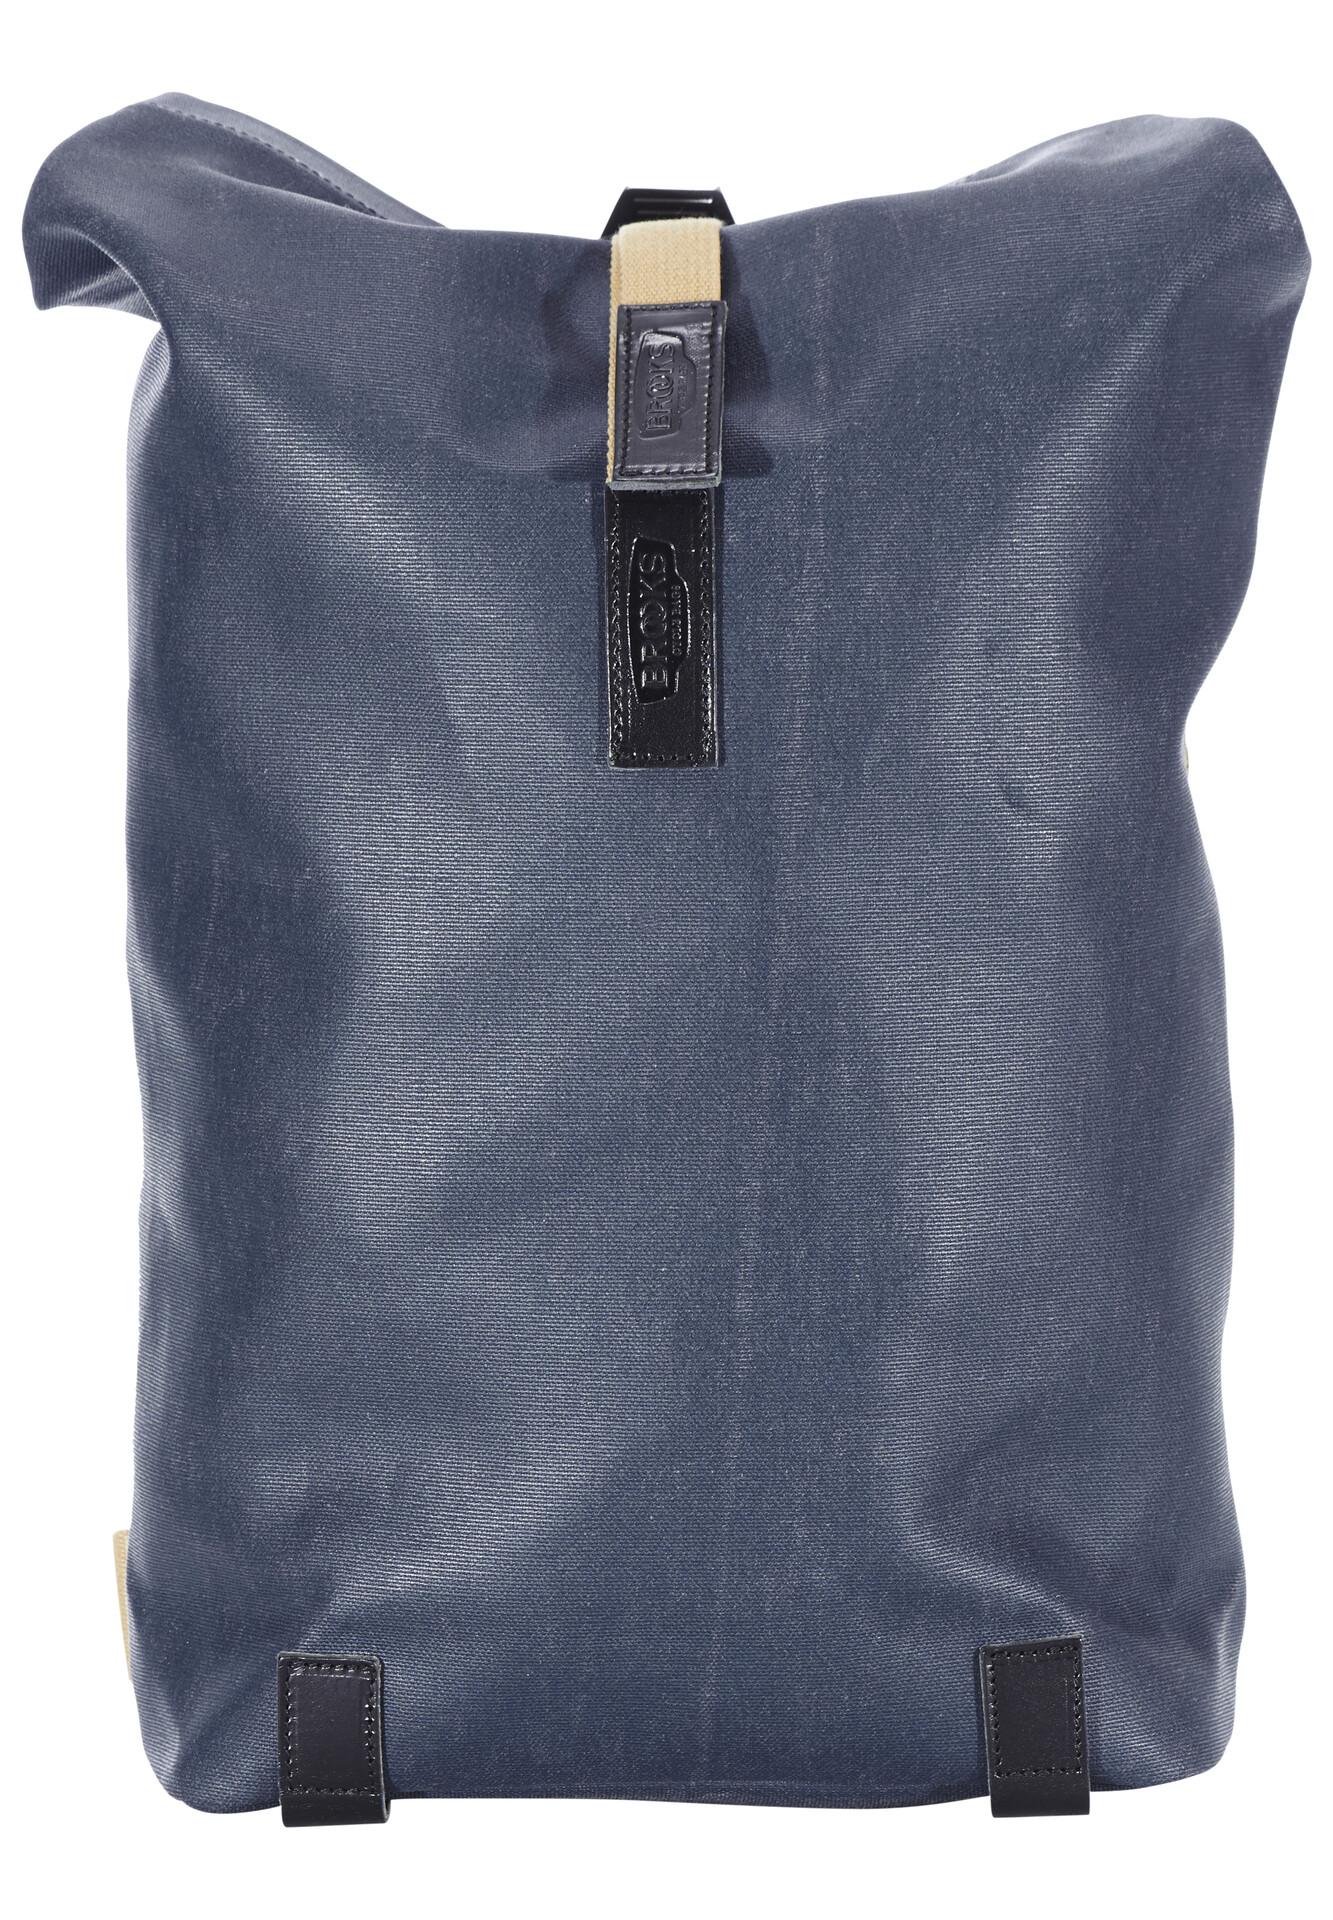 Backpack Pickwick Small Blueblack Brooks Canvas 12lDark CBredxo